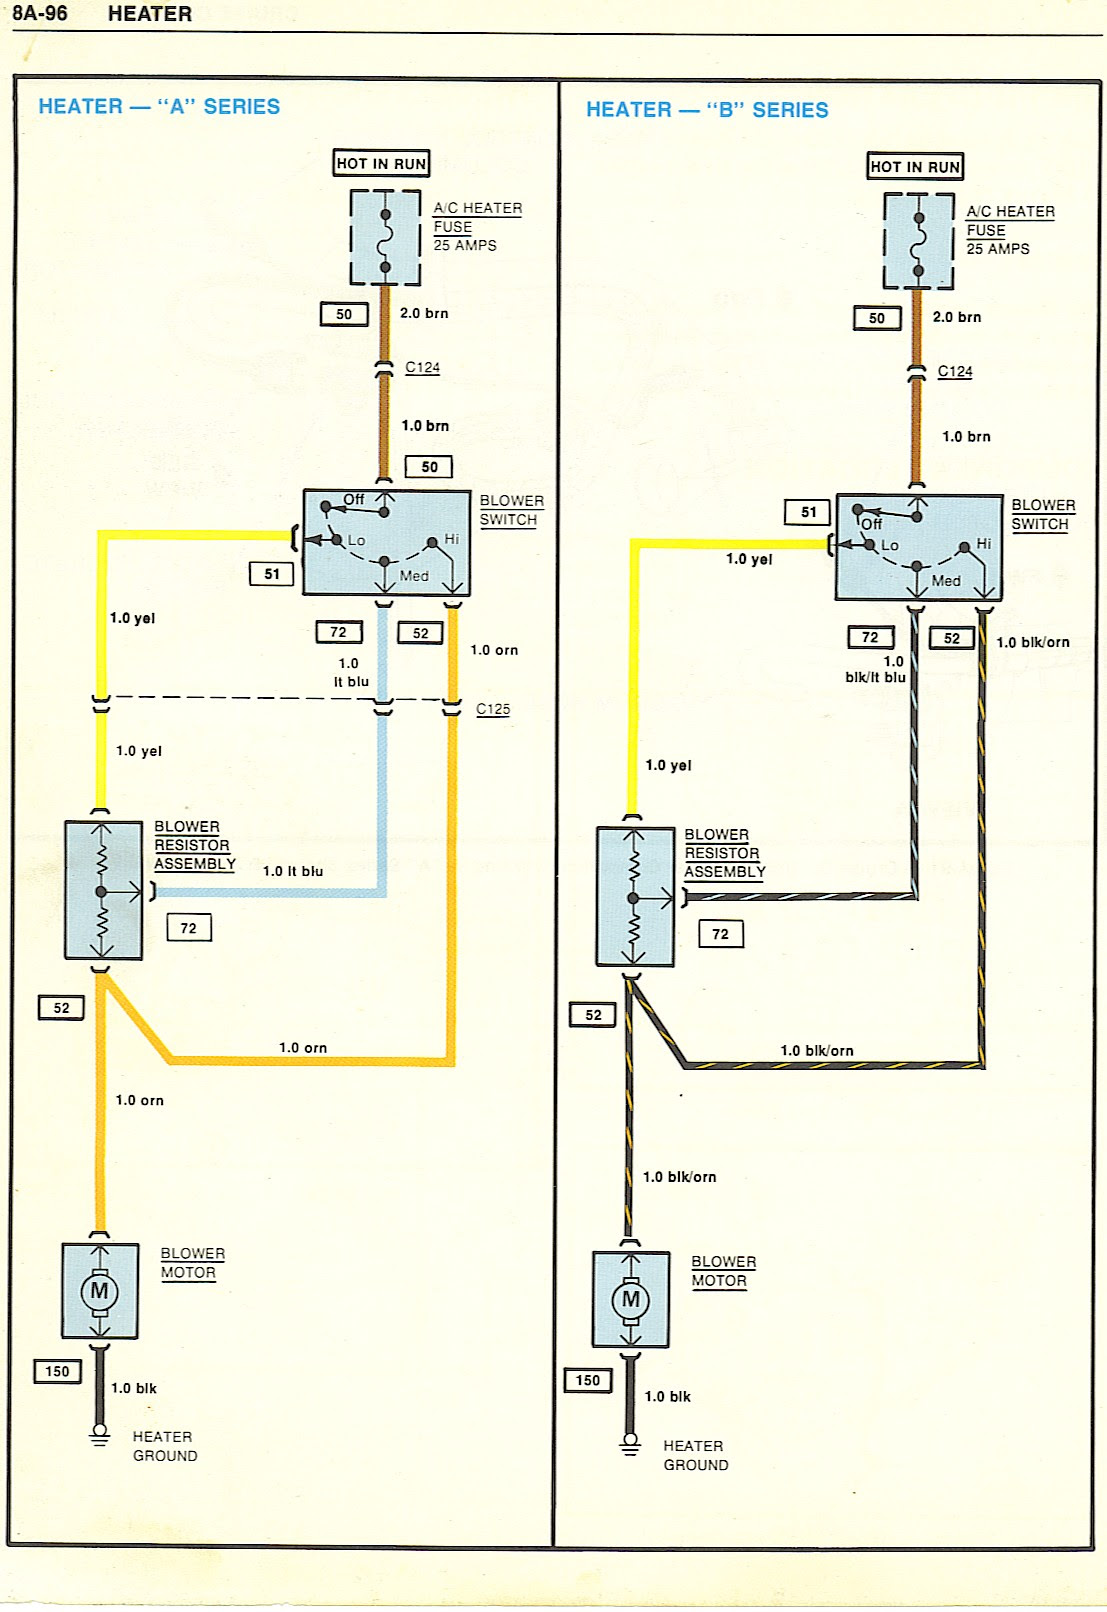 Diagram Wiring Diagrams For 81 Chevy El Camino Full Version Hd Quality El Camino Mentalrewiringl Sacom It